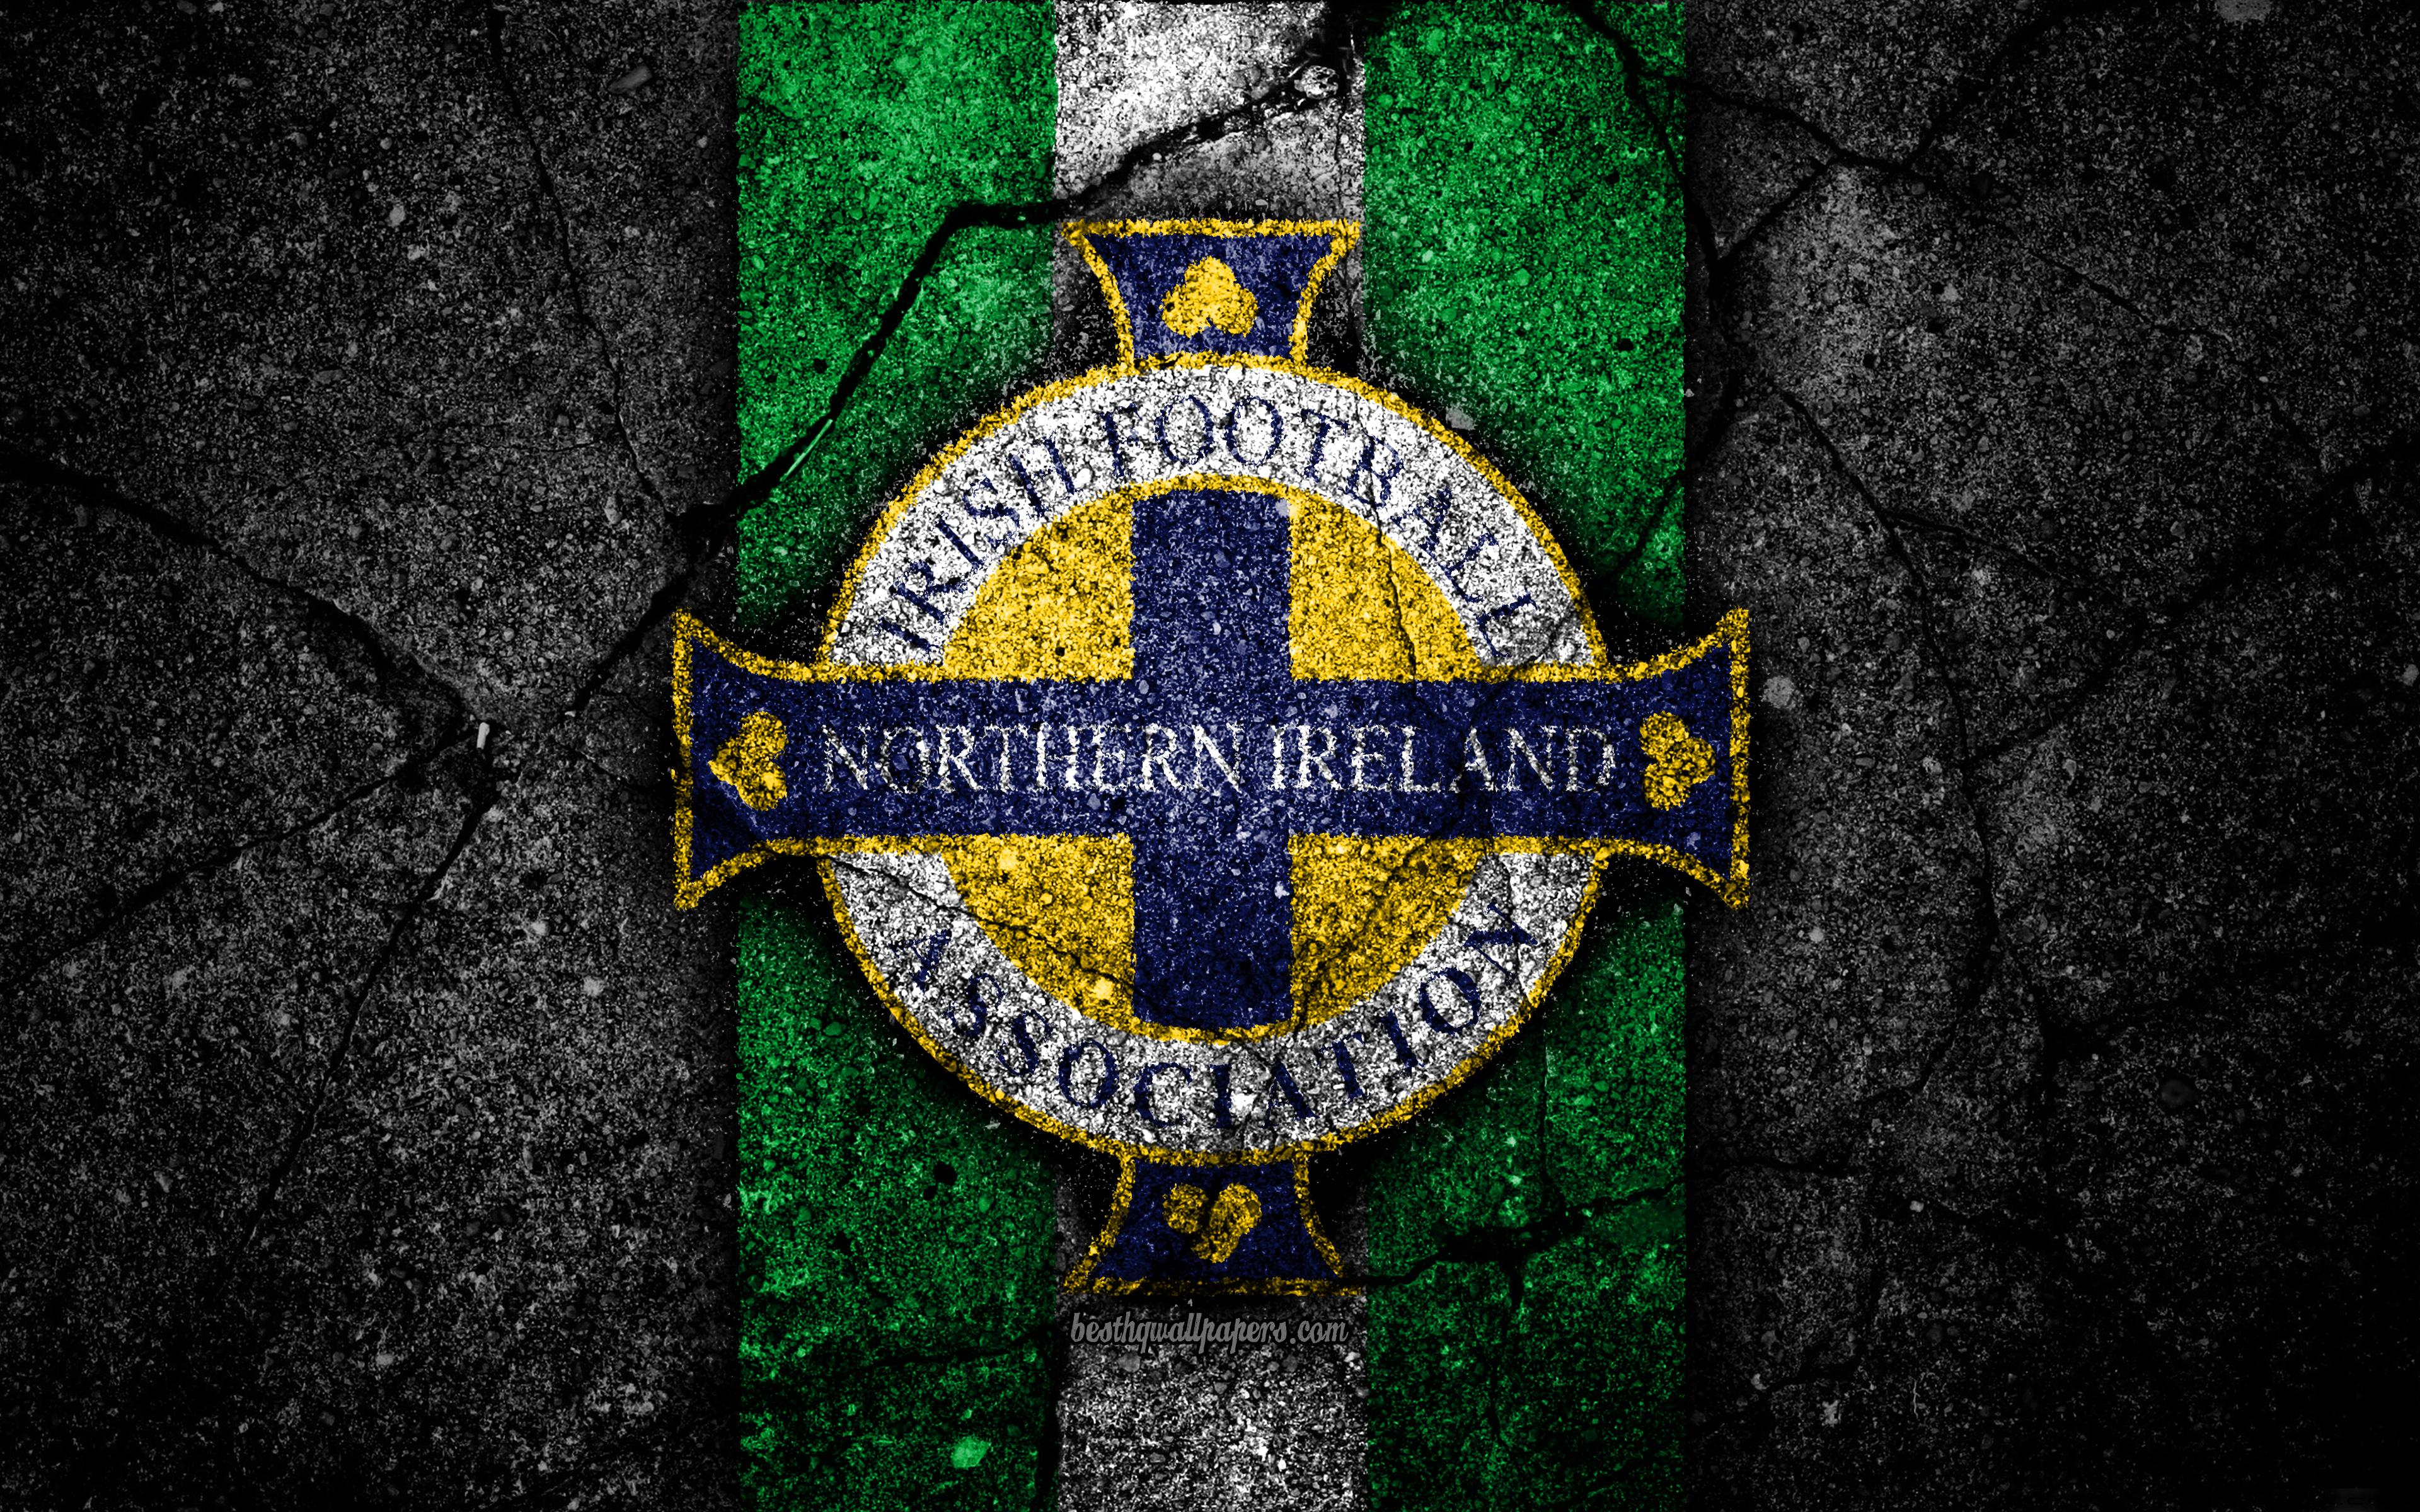 Download wallpapers Northern Ireland football team 4k emblem 3840x2400